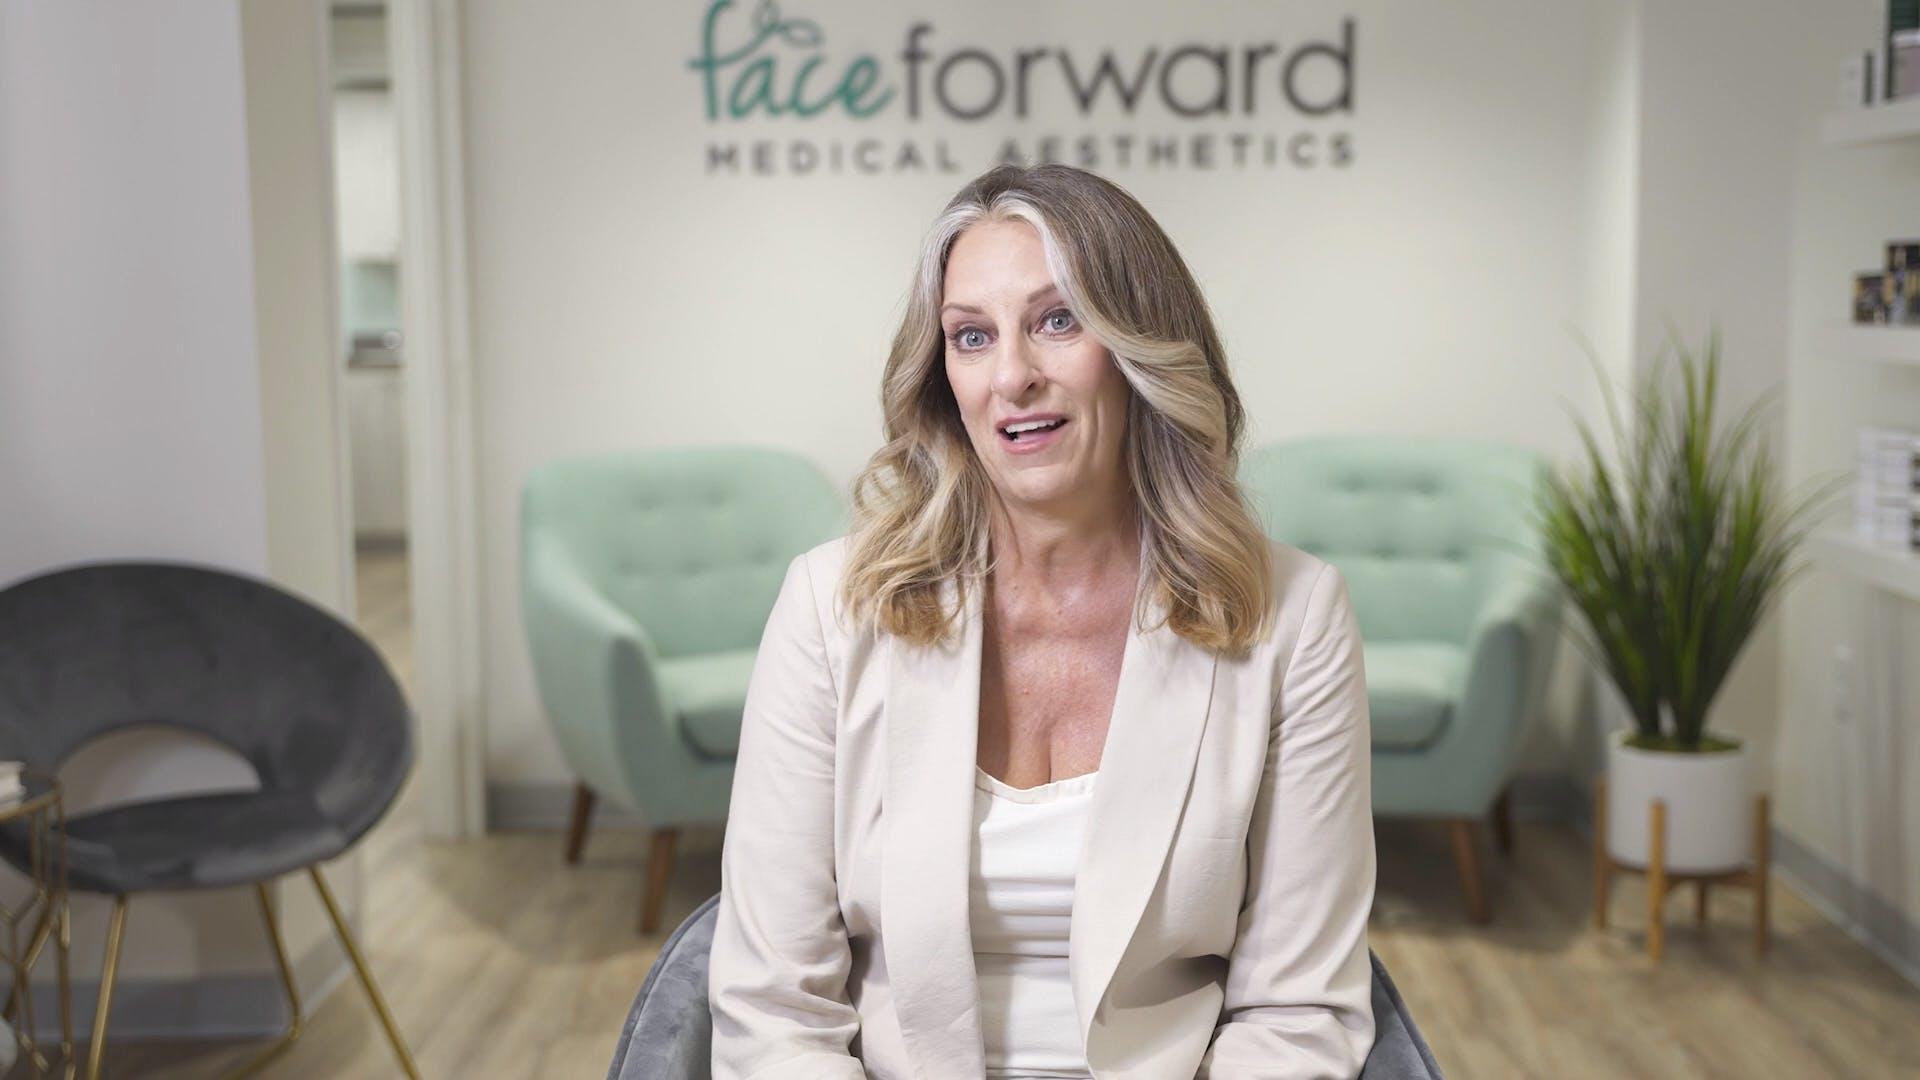 Face Forward Medical Aesthetics